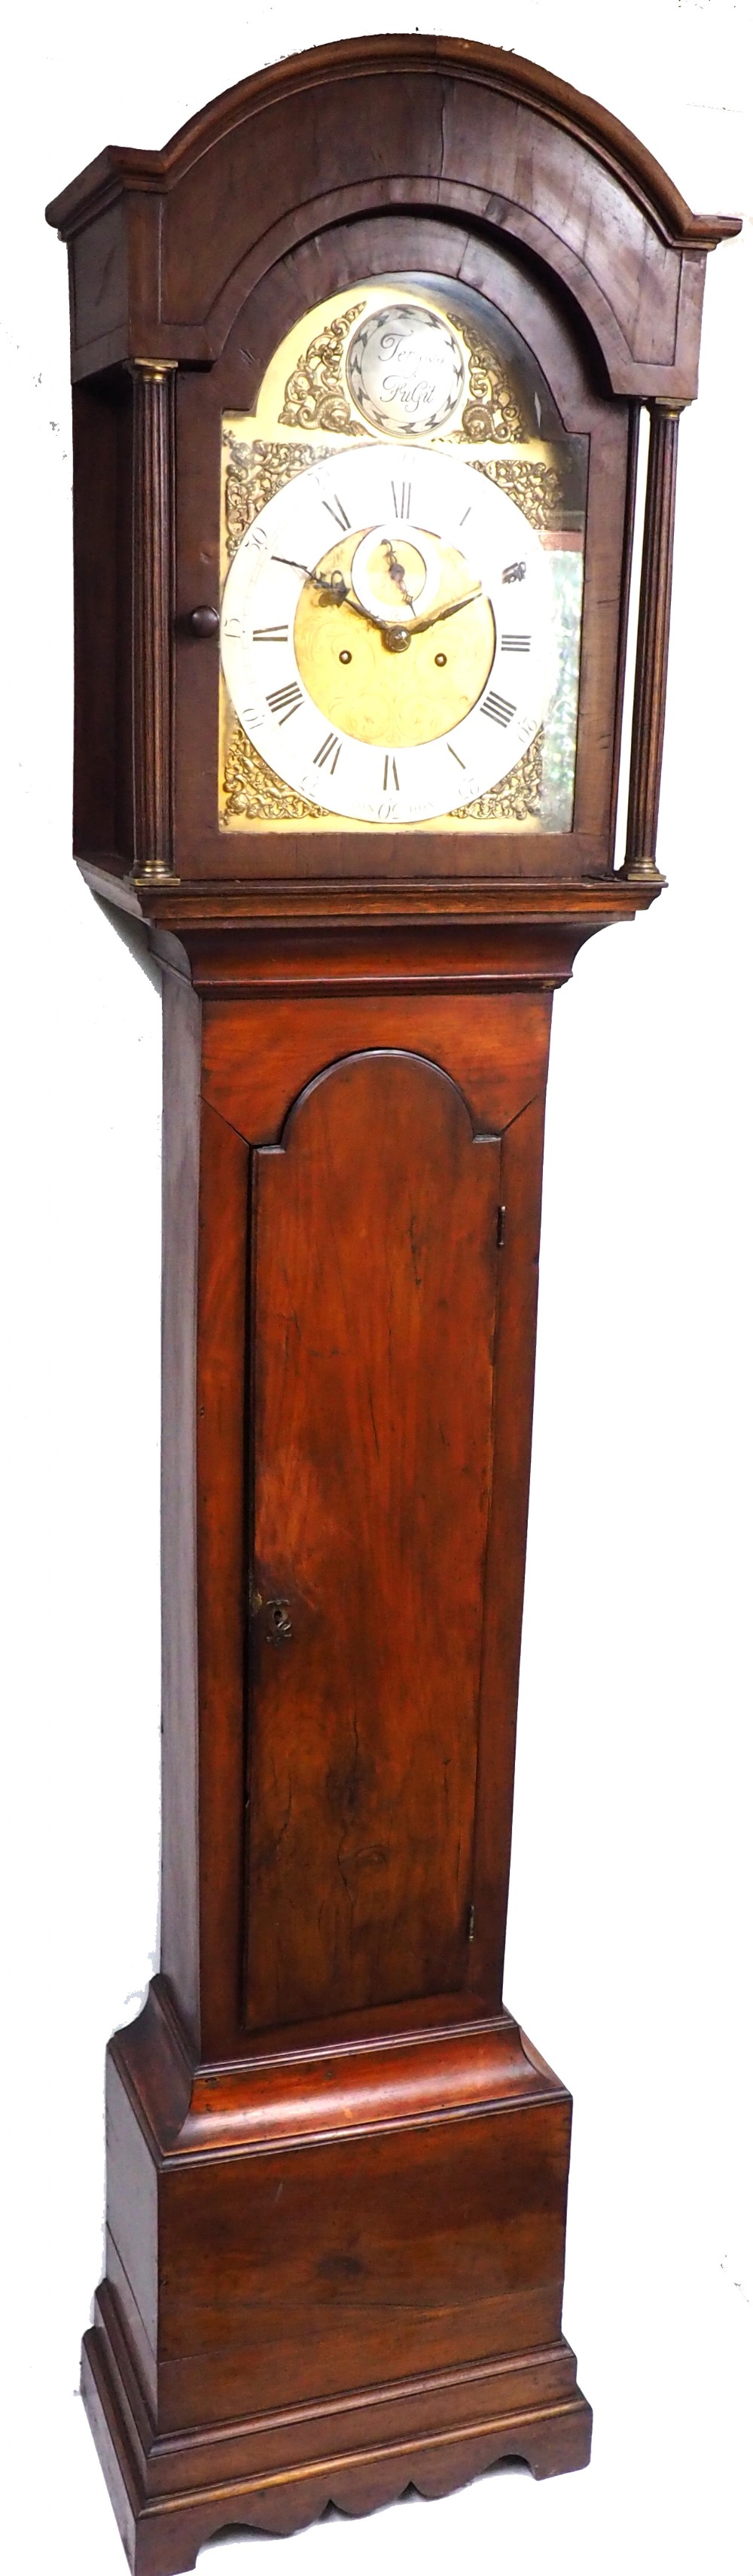 19thc london longcase clock in walnut case arched silver brass dial signed john ward london